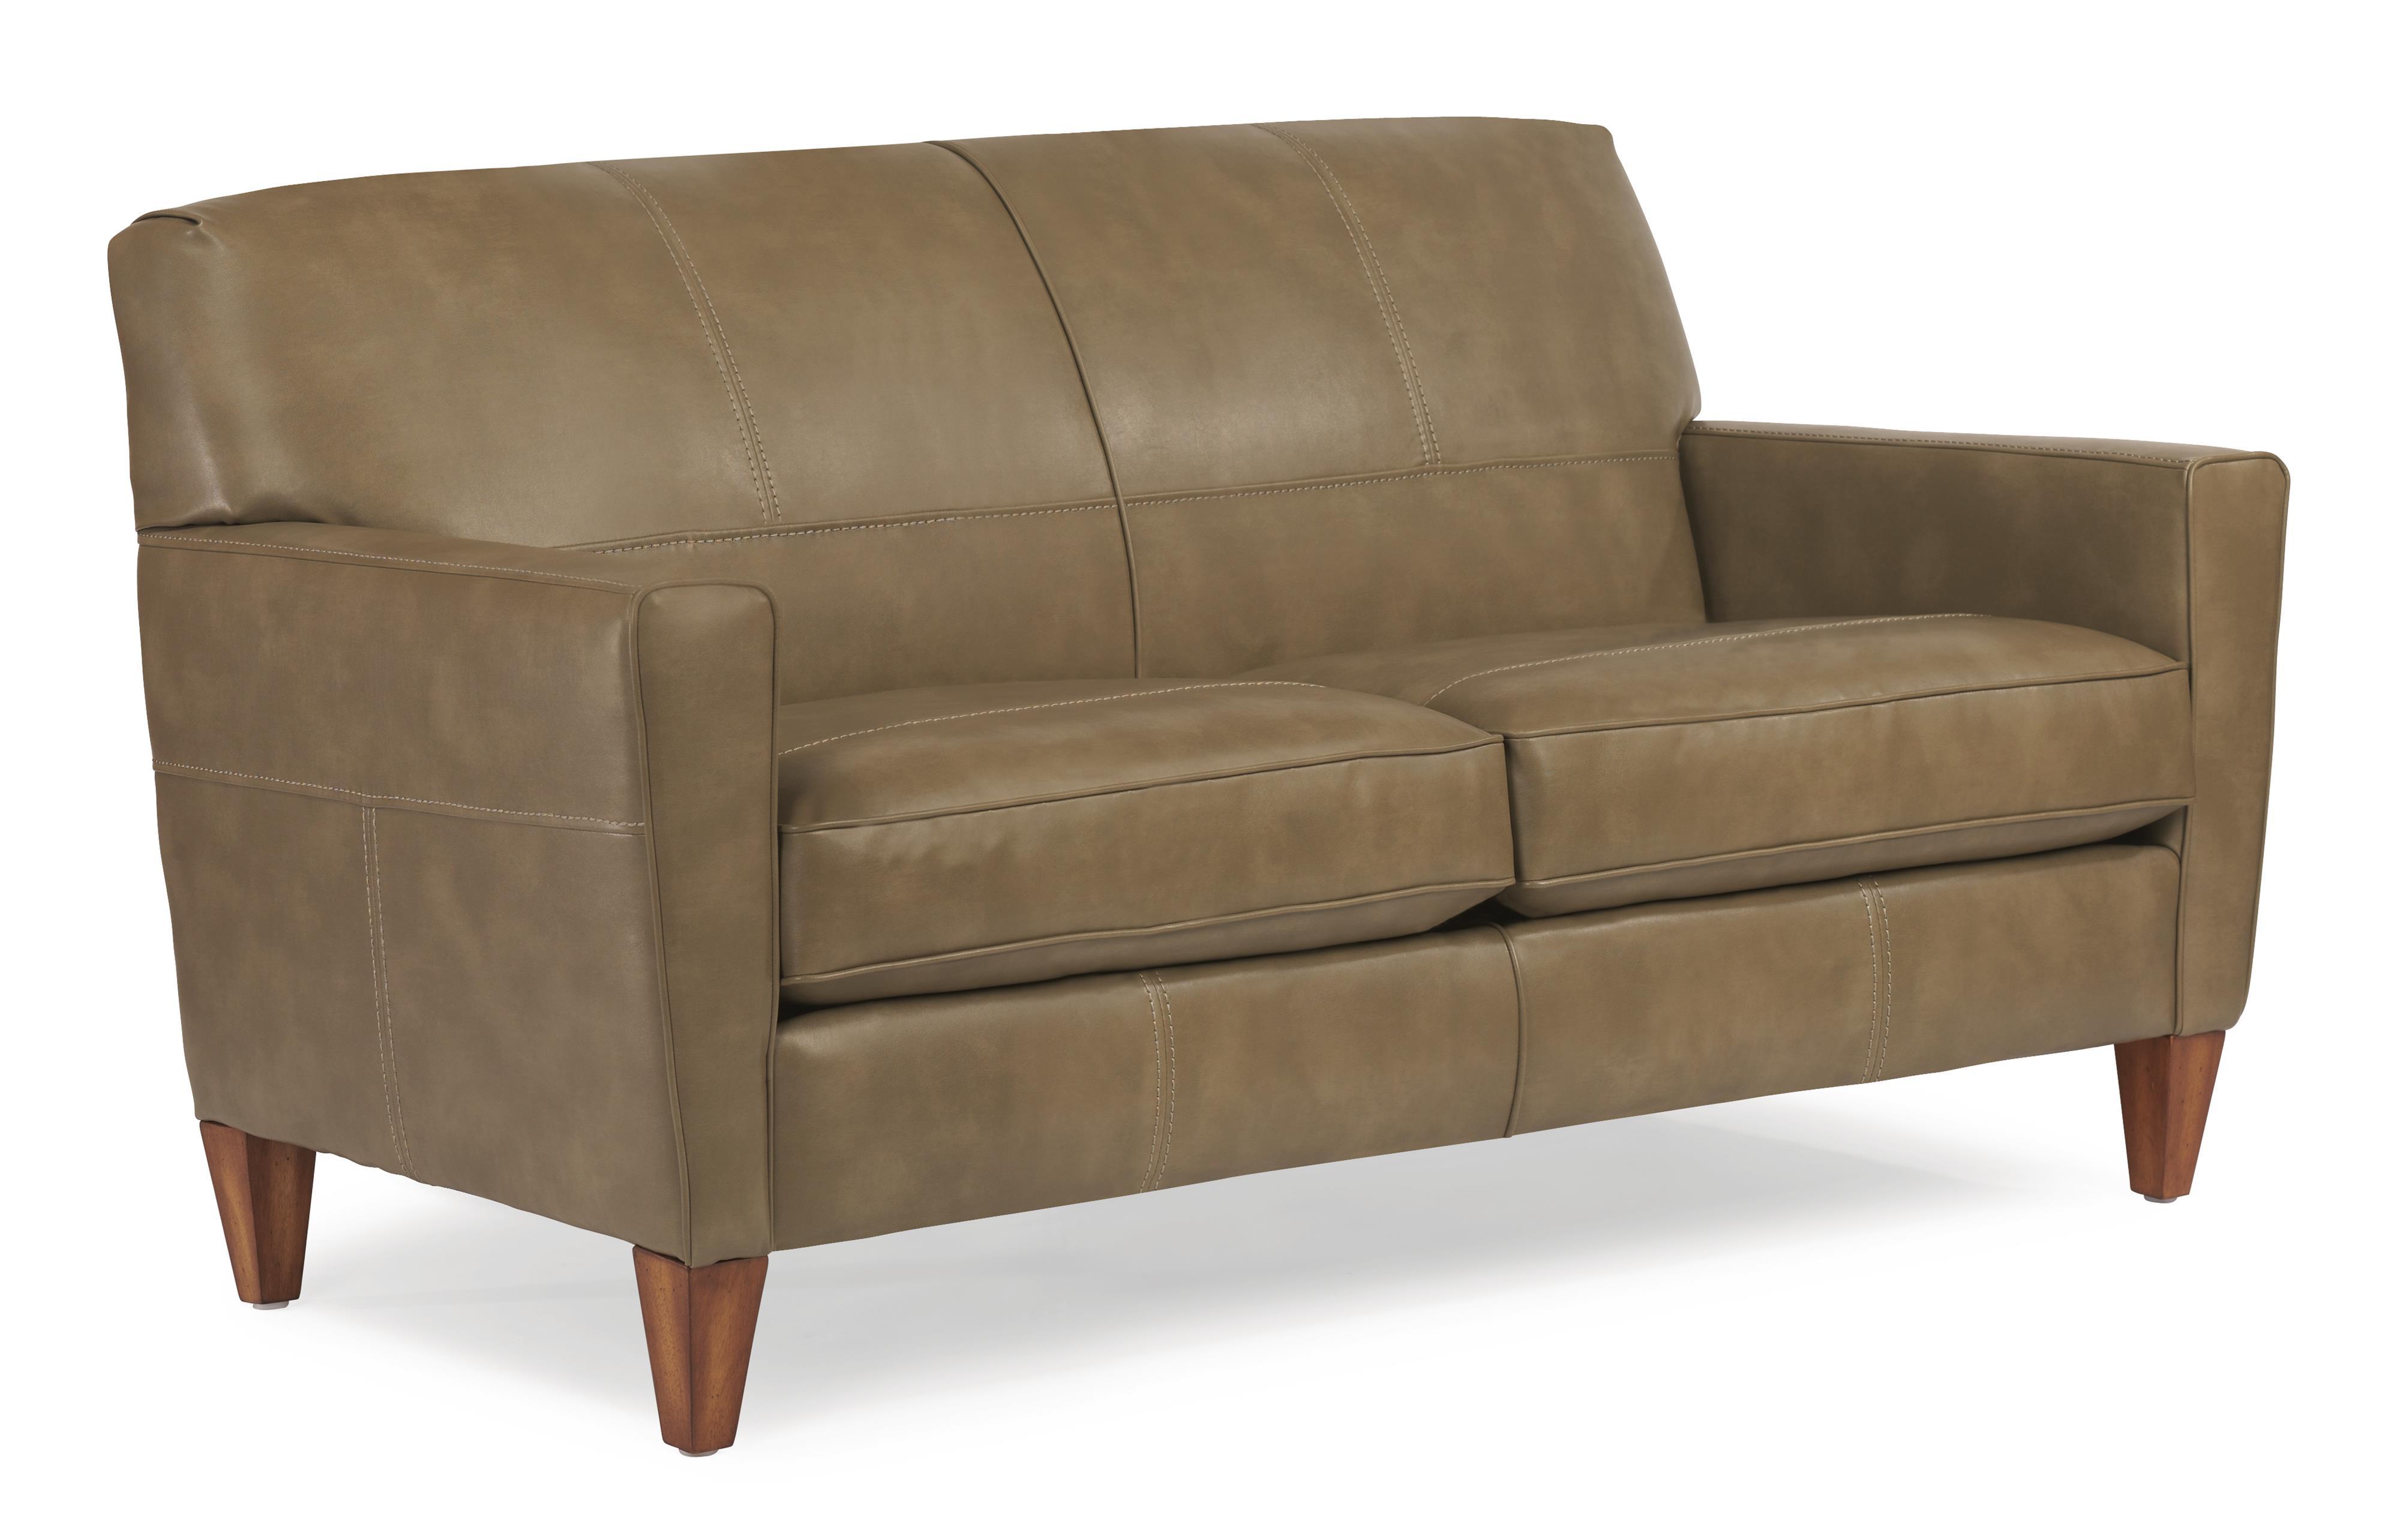 Flexsteel digby 70 sofa w two cushions boulevard home for Sofa 1 70 breit